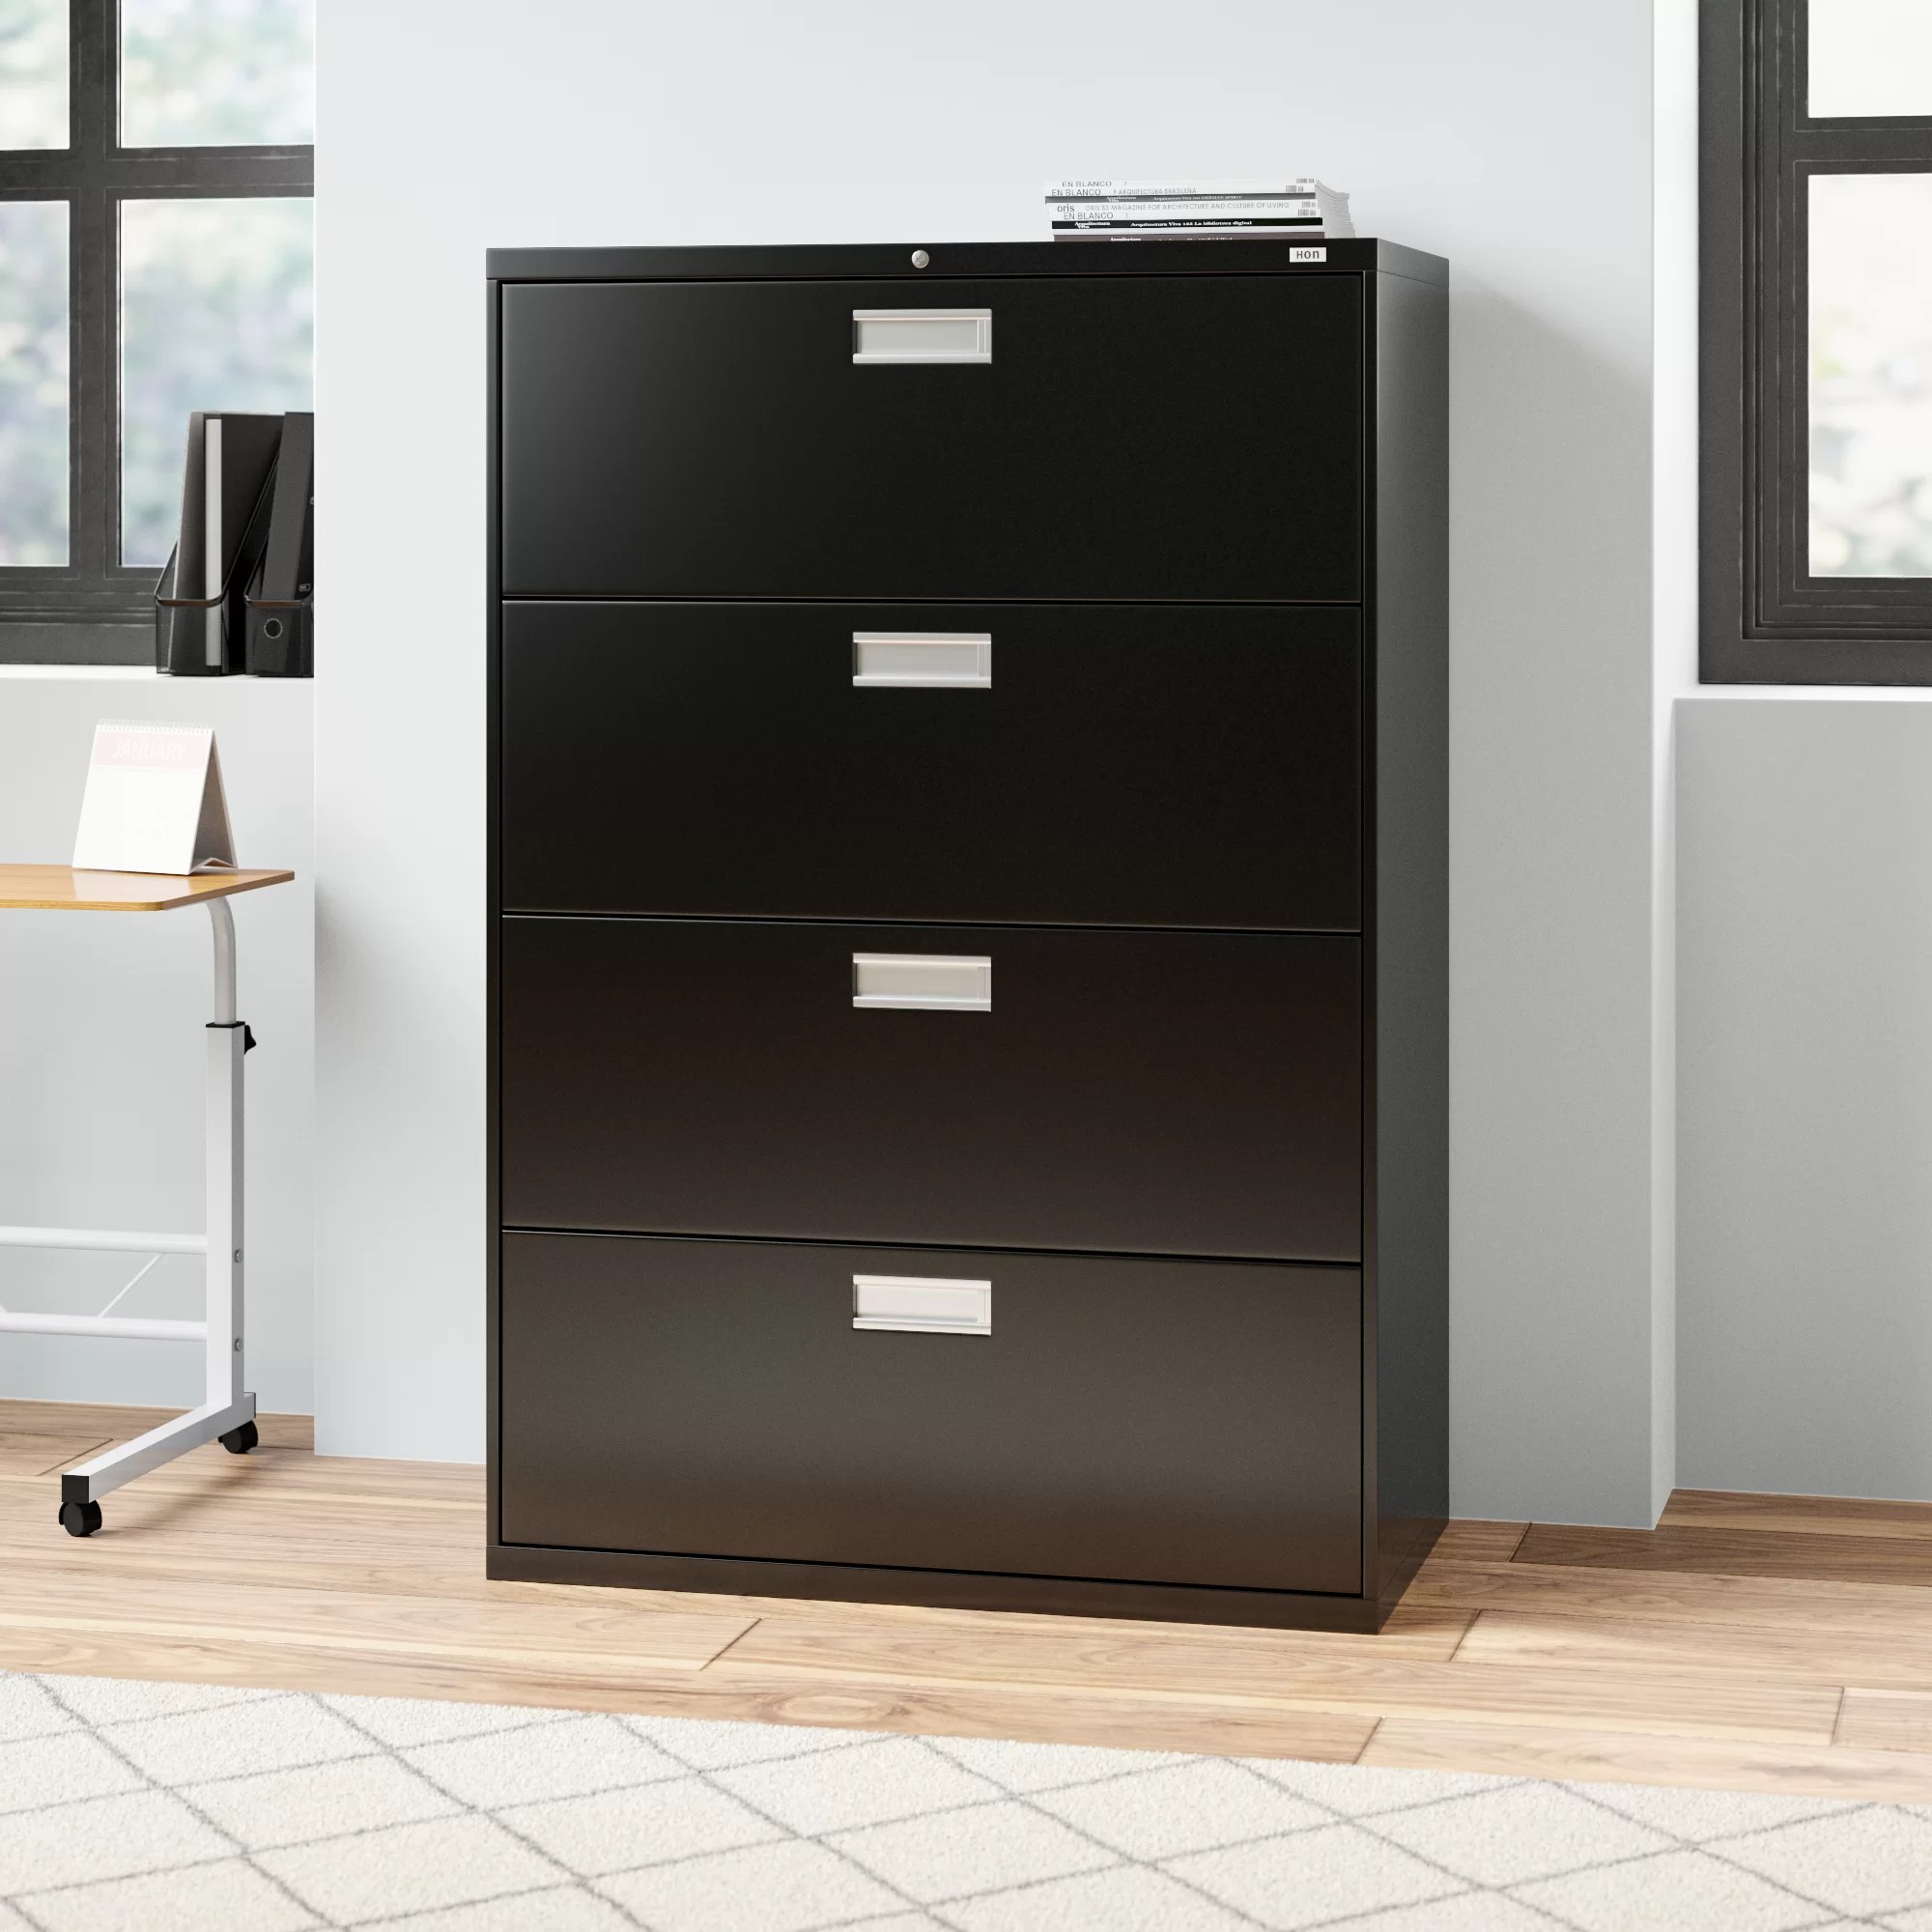 Hon Brigade 600 Series 4 Drawer Lateral Filing Cabinet Reviews Wayfair